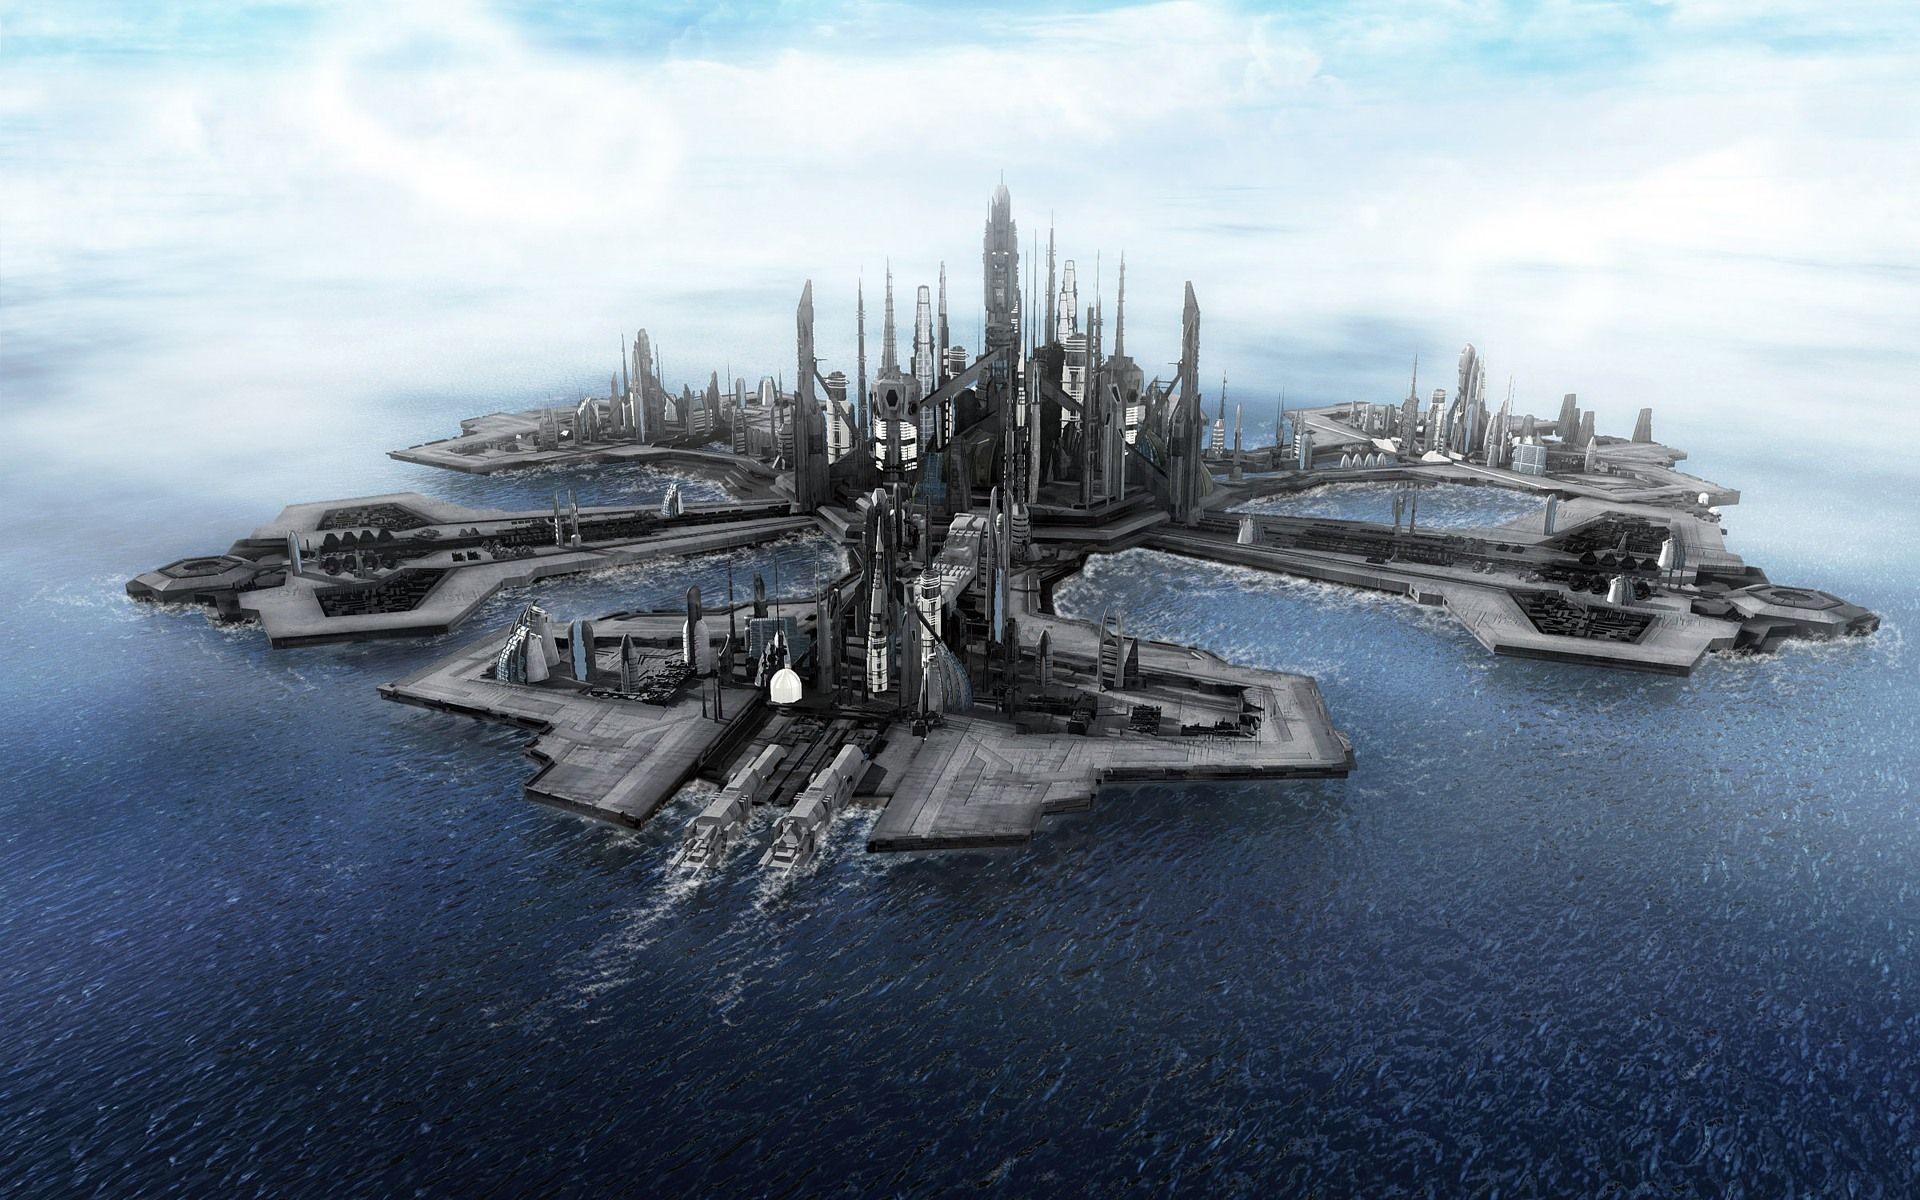 floating-city.jpg (1920×1200)